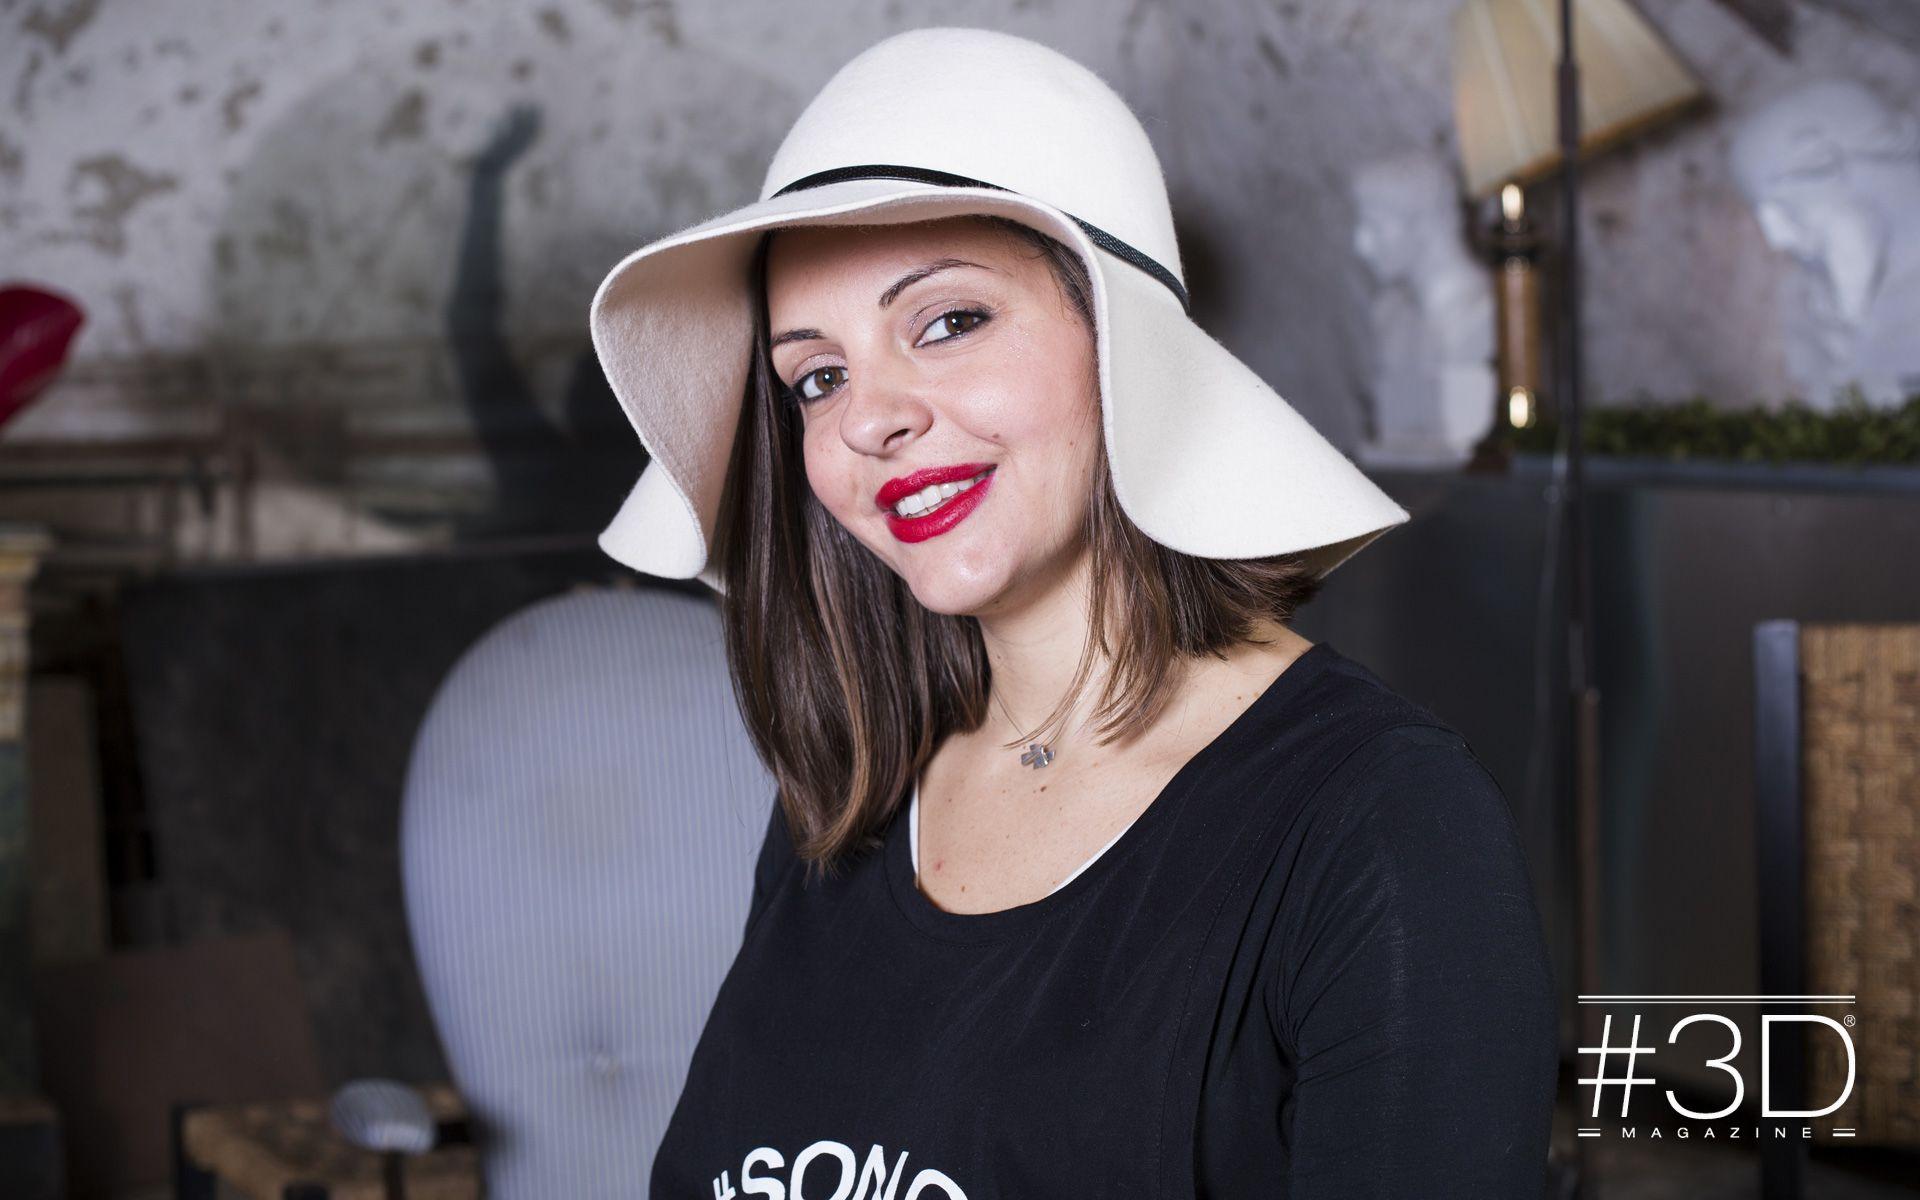 Manuela Giuliano